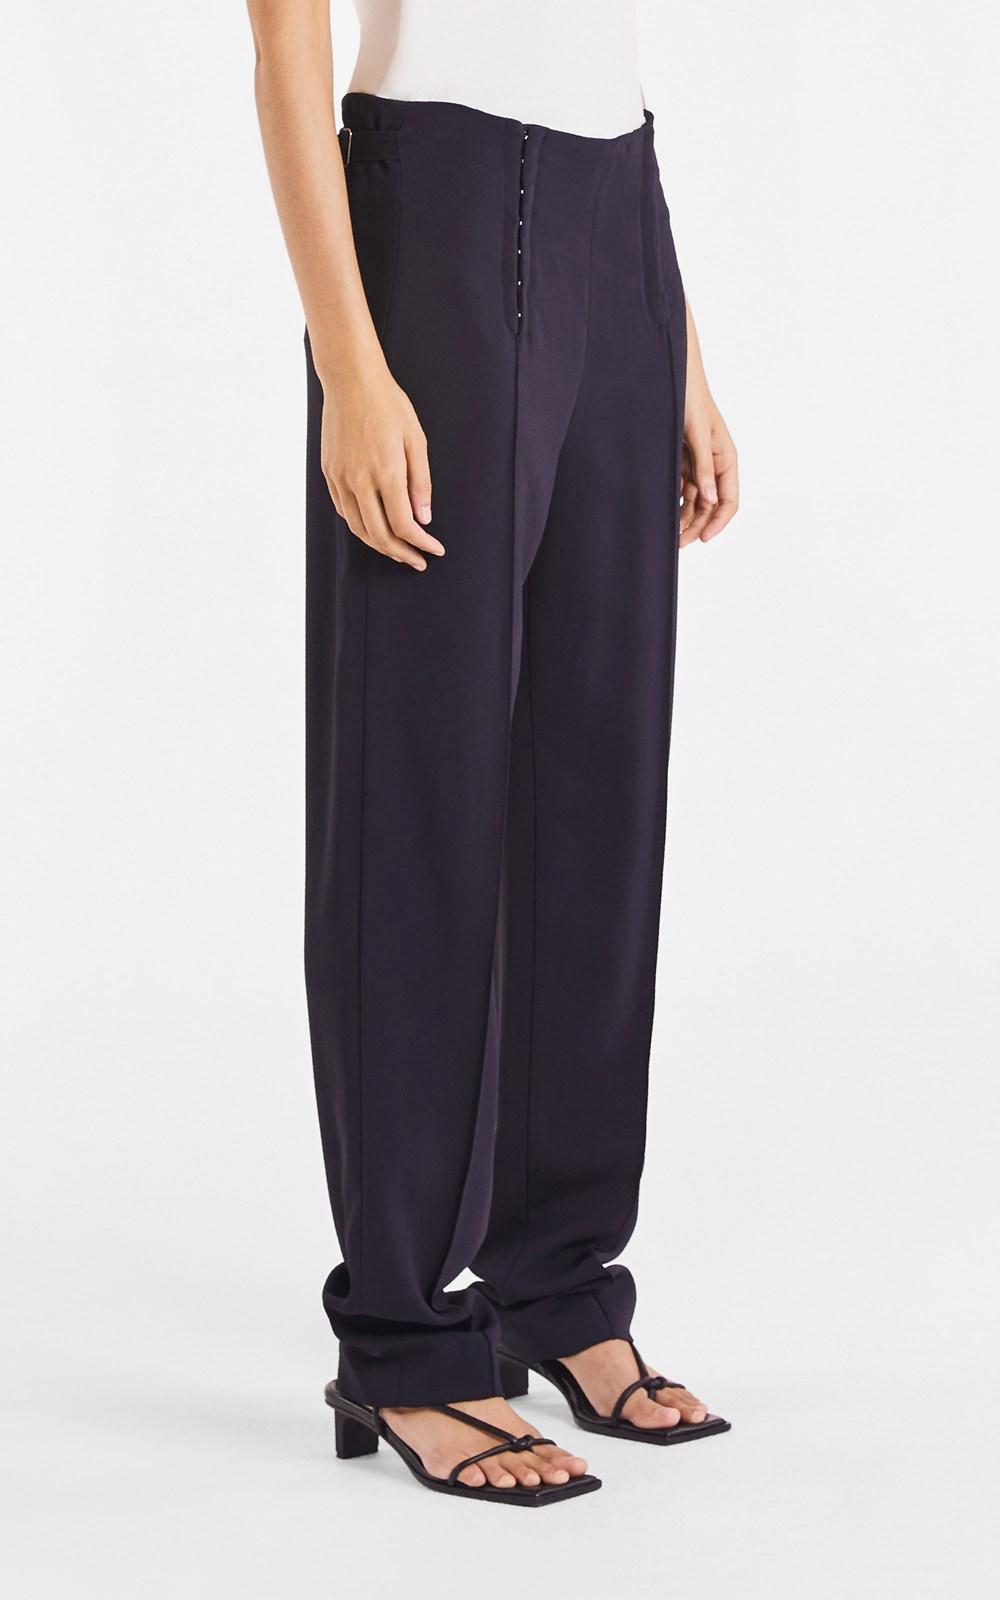 Pants | CORSET TROUSER